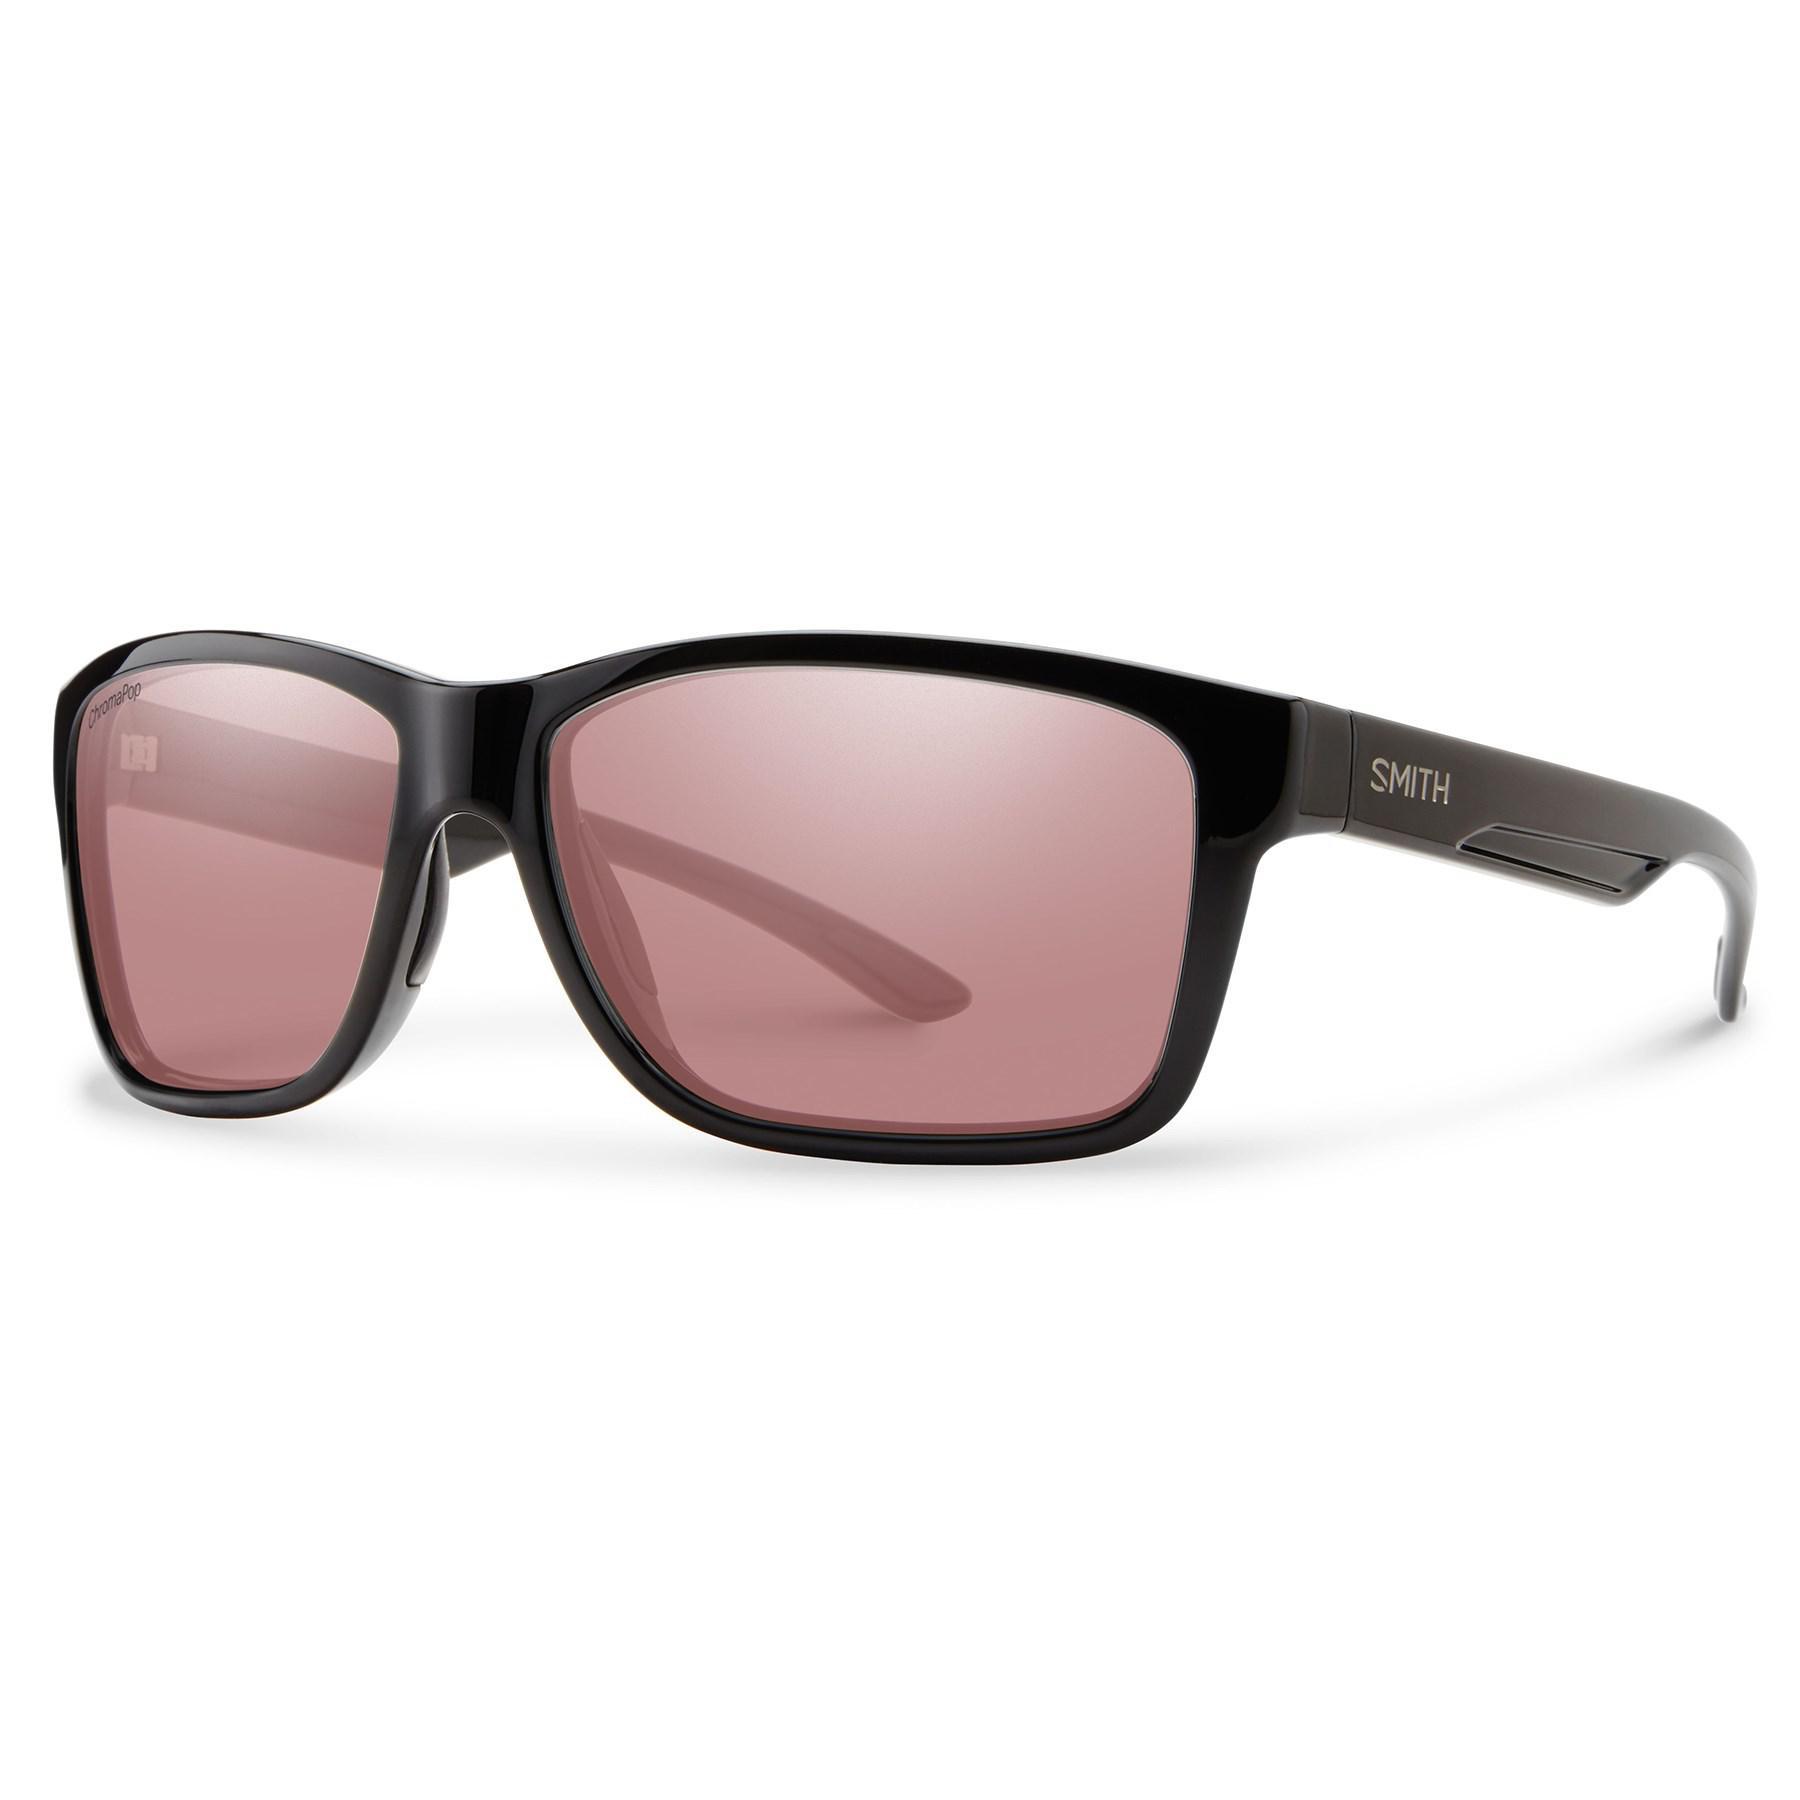 c397aadb32 Lyst - Smith Optics Ridgewell Chromapop® Sunglasses in Black for Men